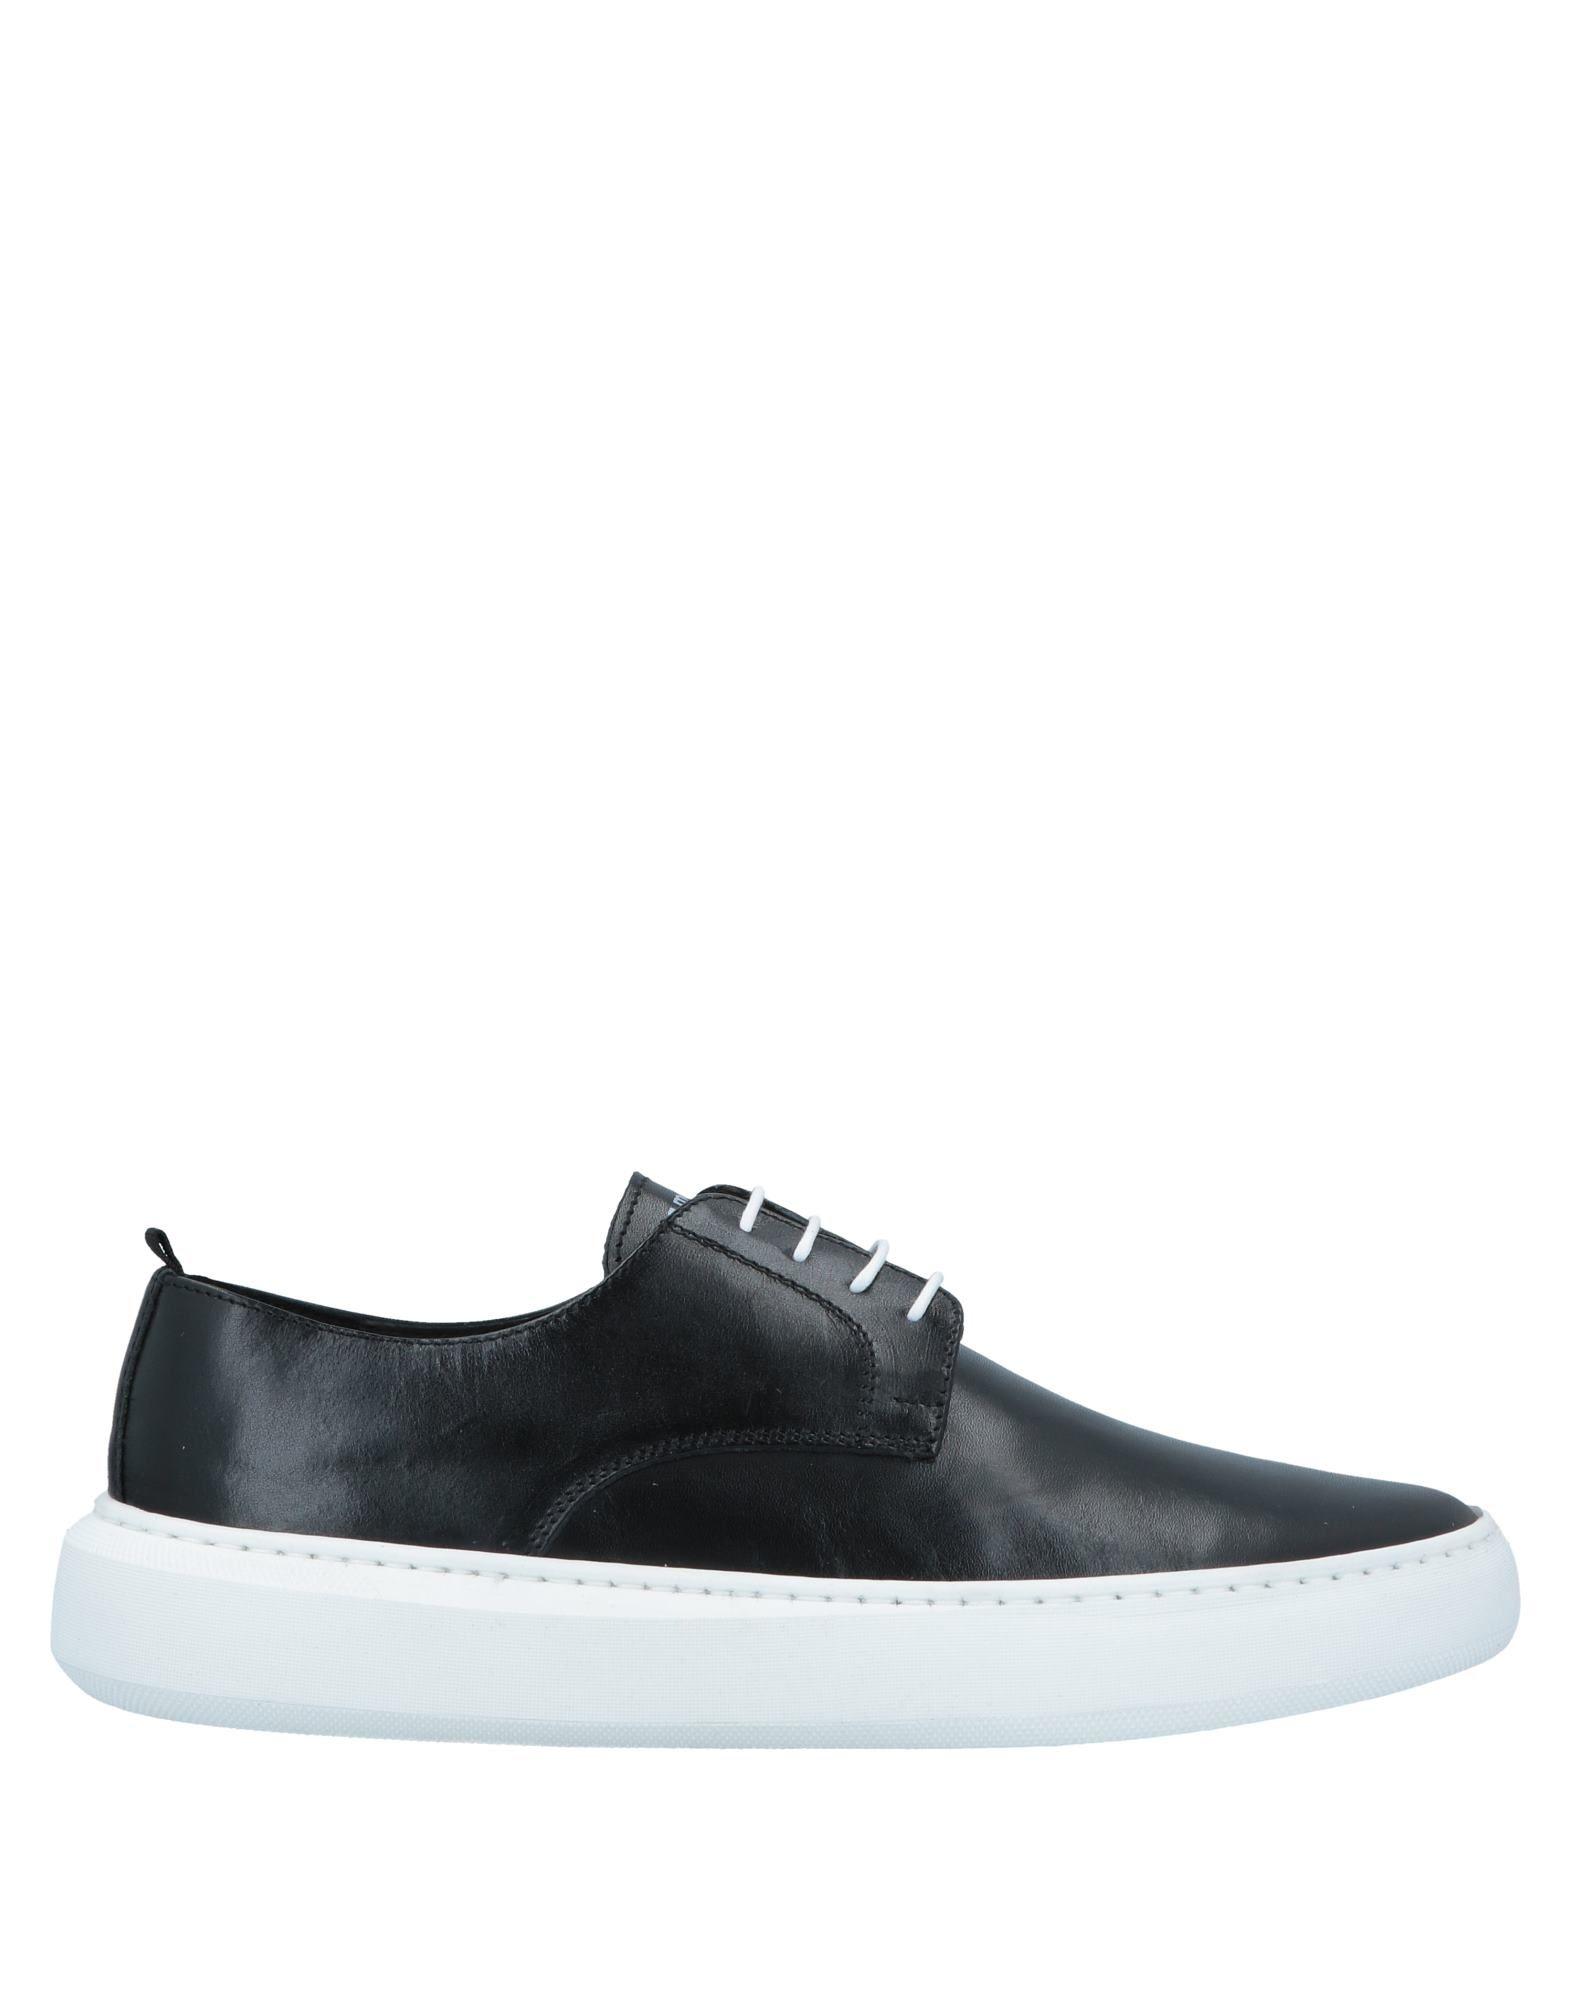 BOTTEGA MARCHIGIANA Низкие кеды и кроссовки bottega marchigiana высокие кеды и кроссовки